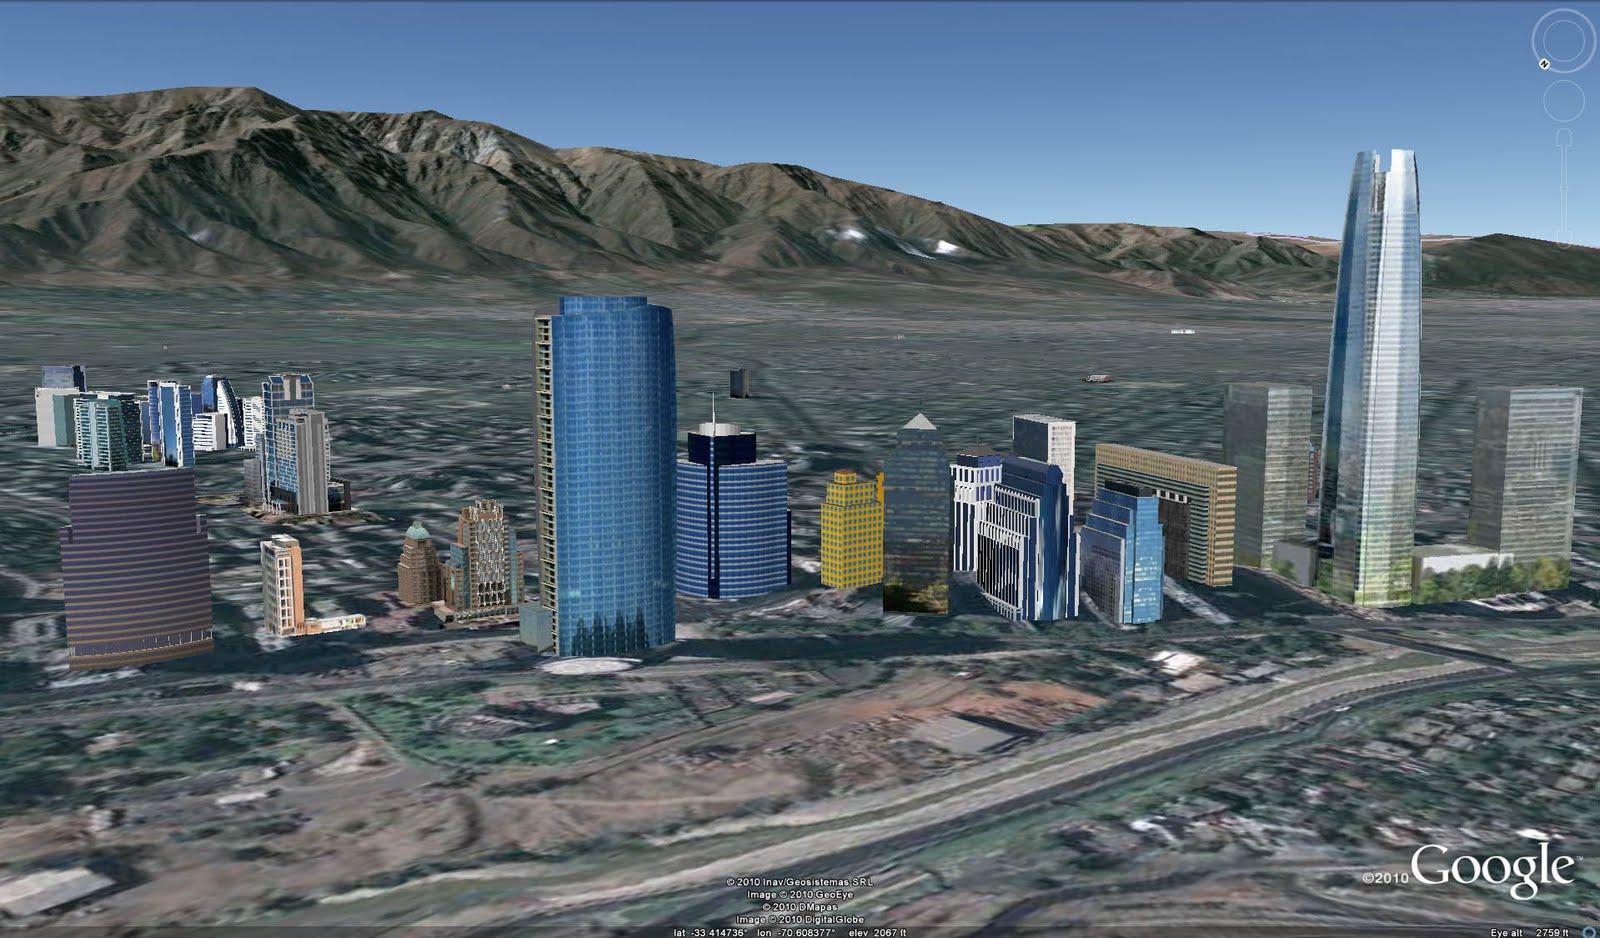 Google earth pro 6.0.0.1735